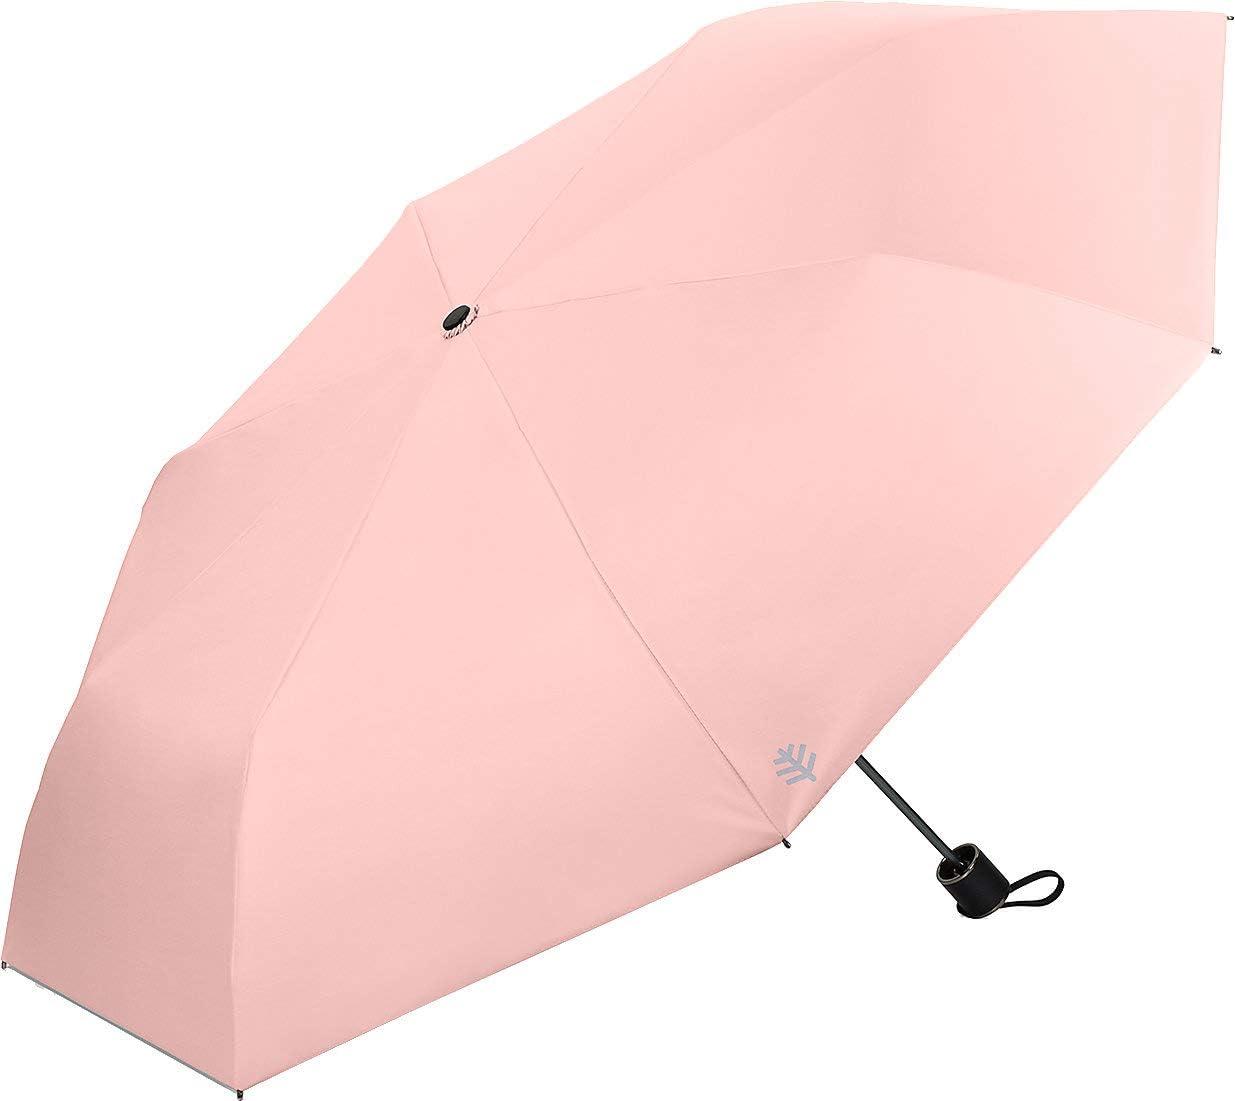 Coolibar UPF 50+ Bund Compact Umbrella - Sun Protective (One Size- Light Rose)